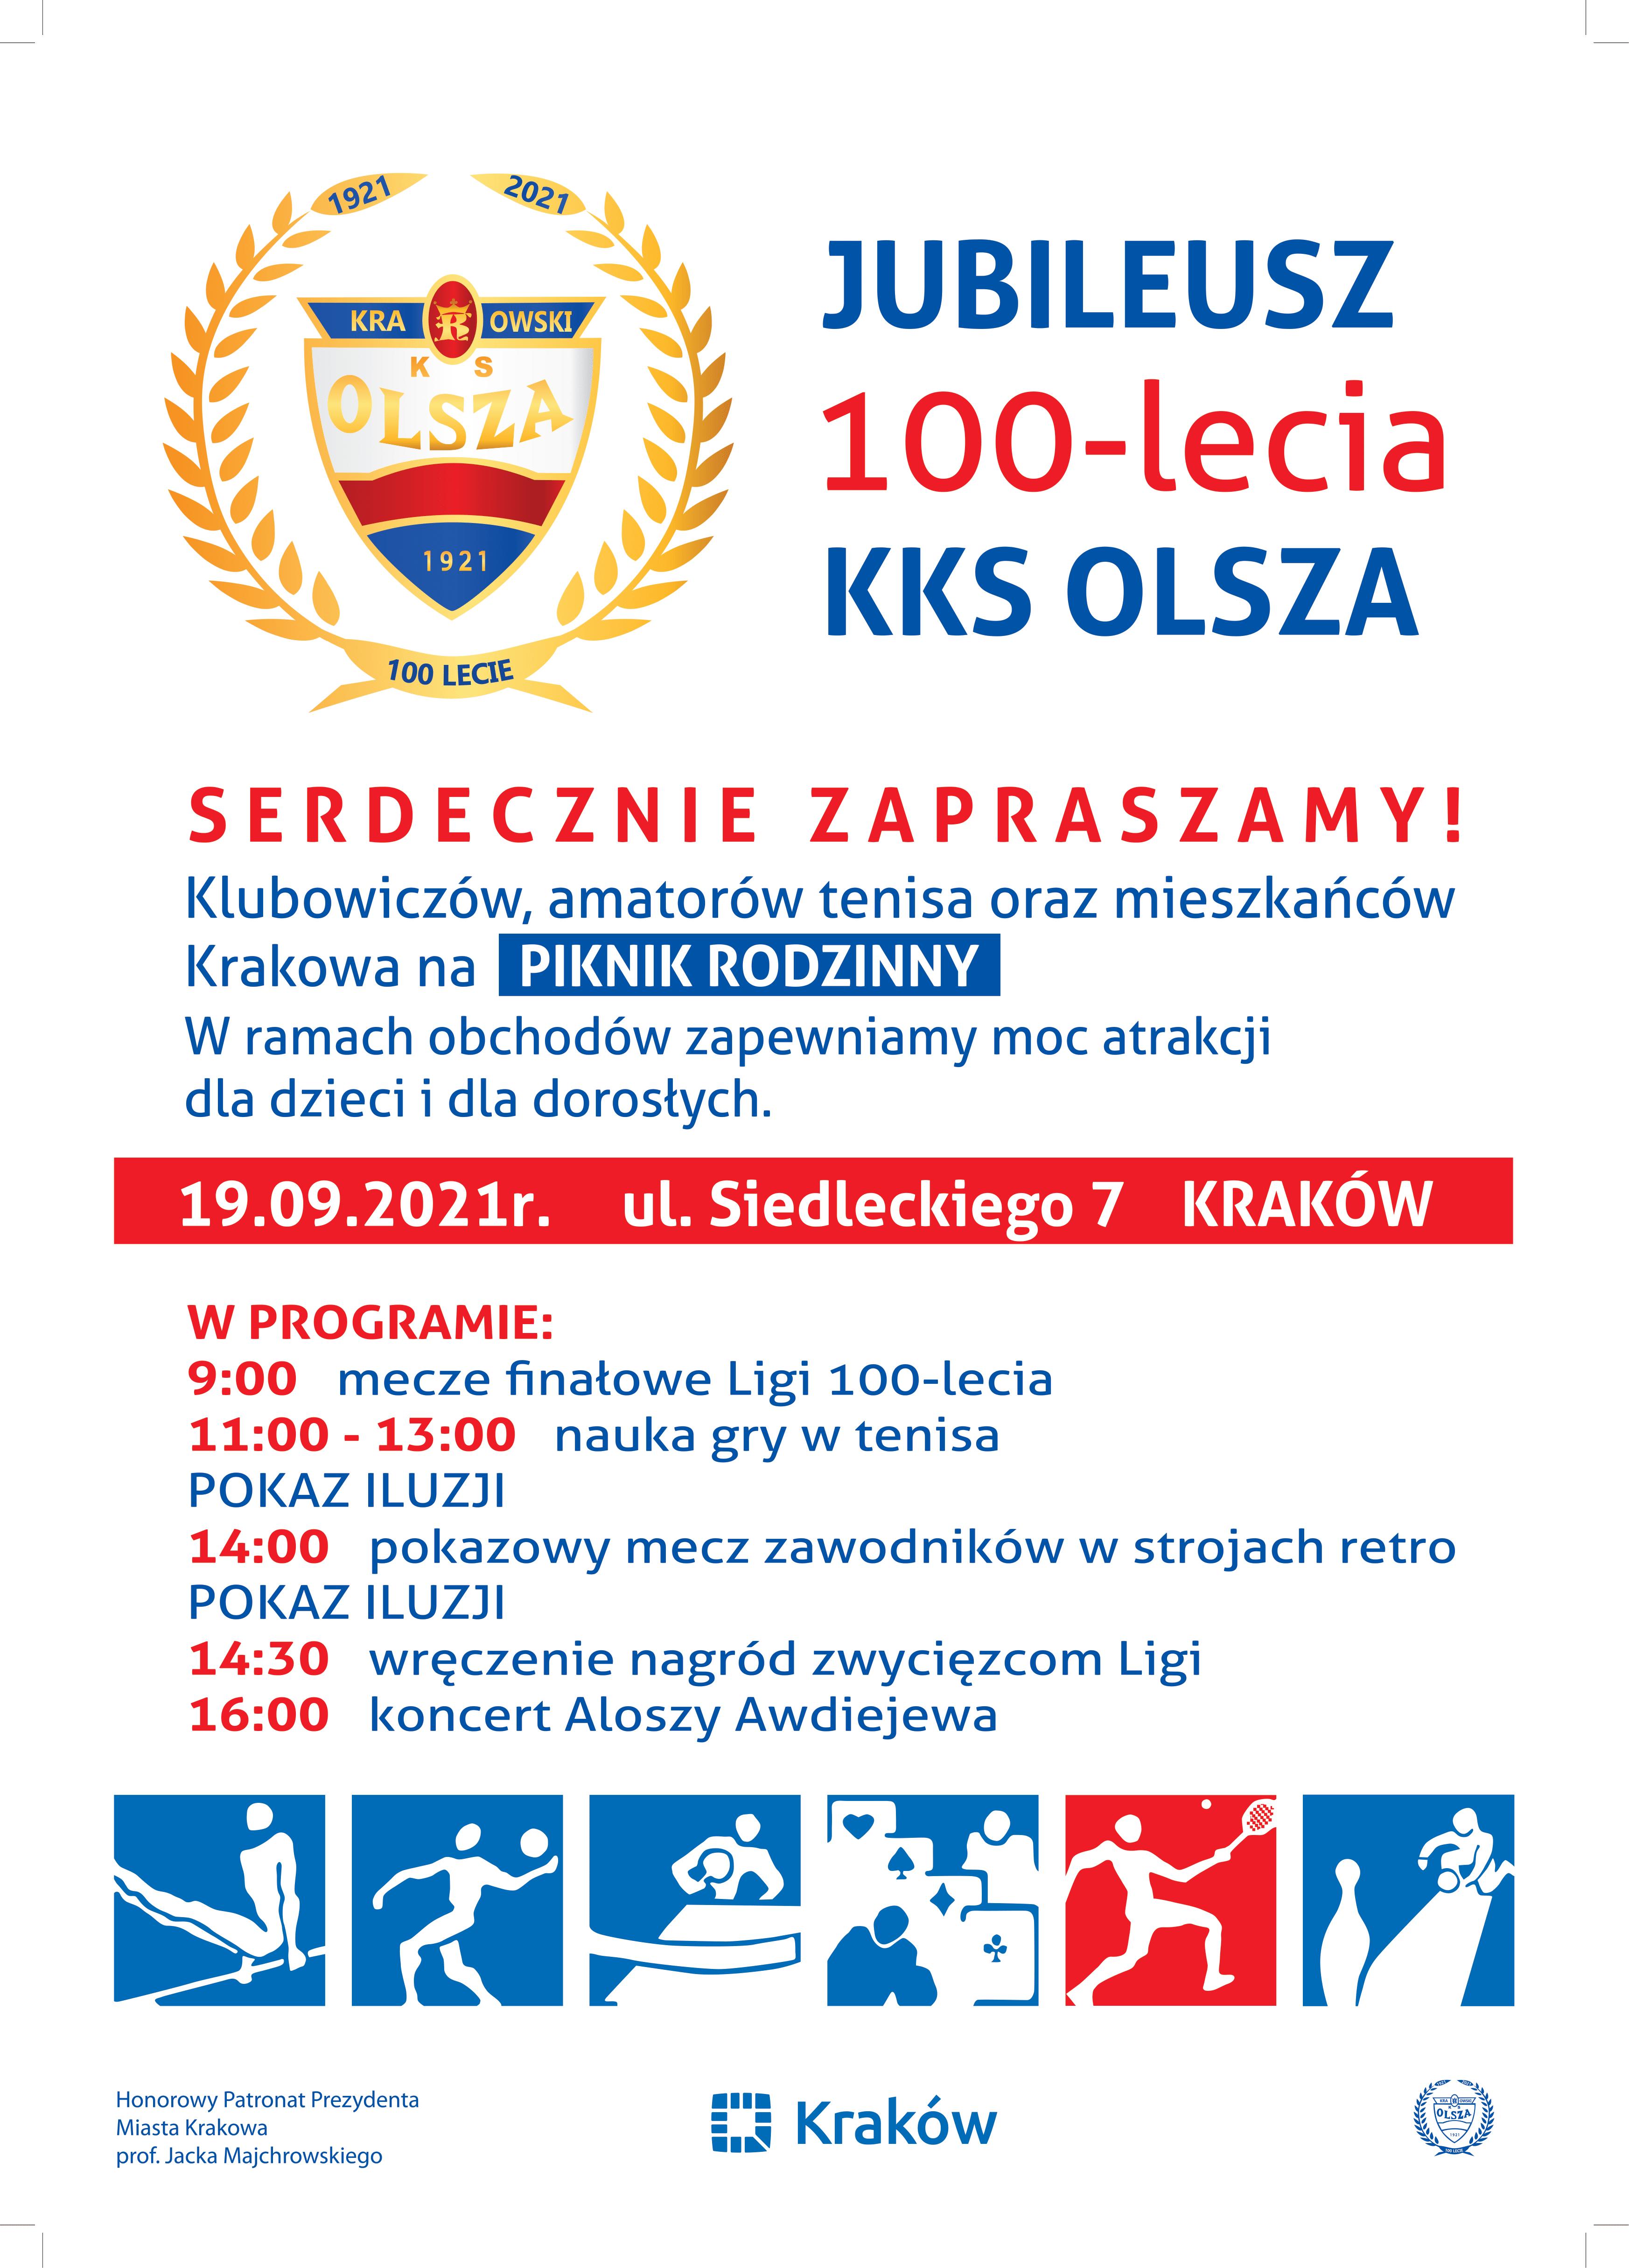 Jubileusz 100-lecia KKS Olsza